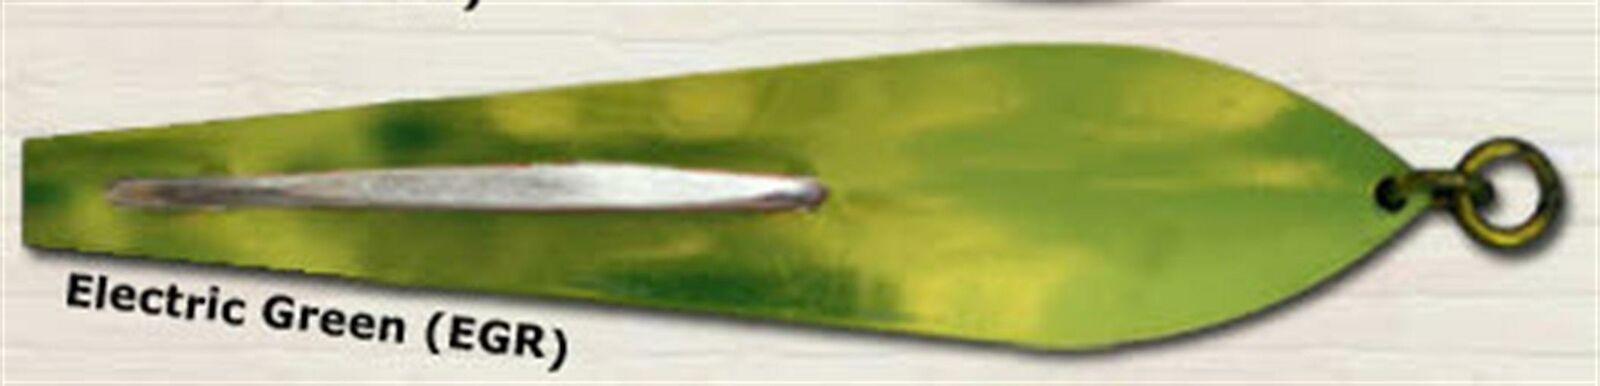 Huntington 45EGRSFS Drone Blinker Bemalt Grün   Silber Blitz Waage 12 0 20390